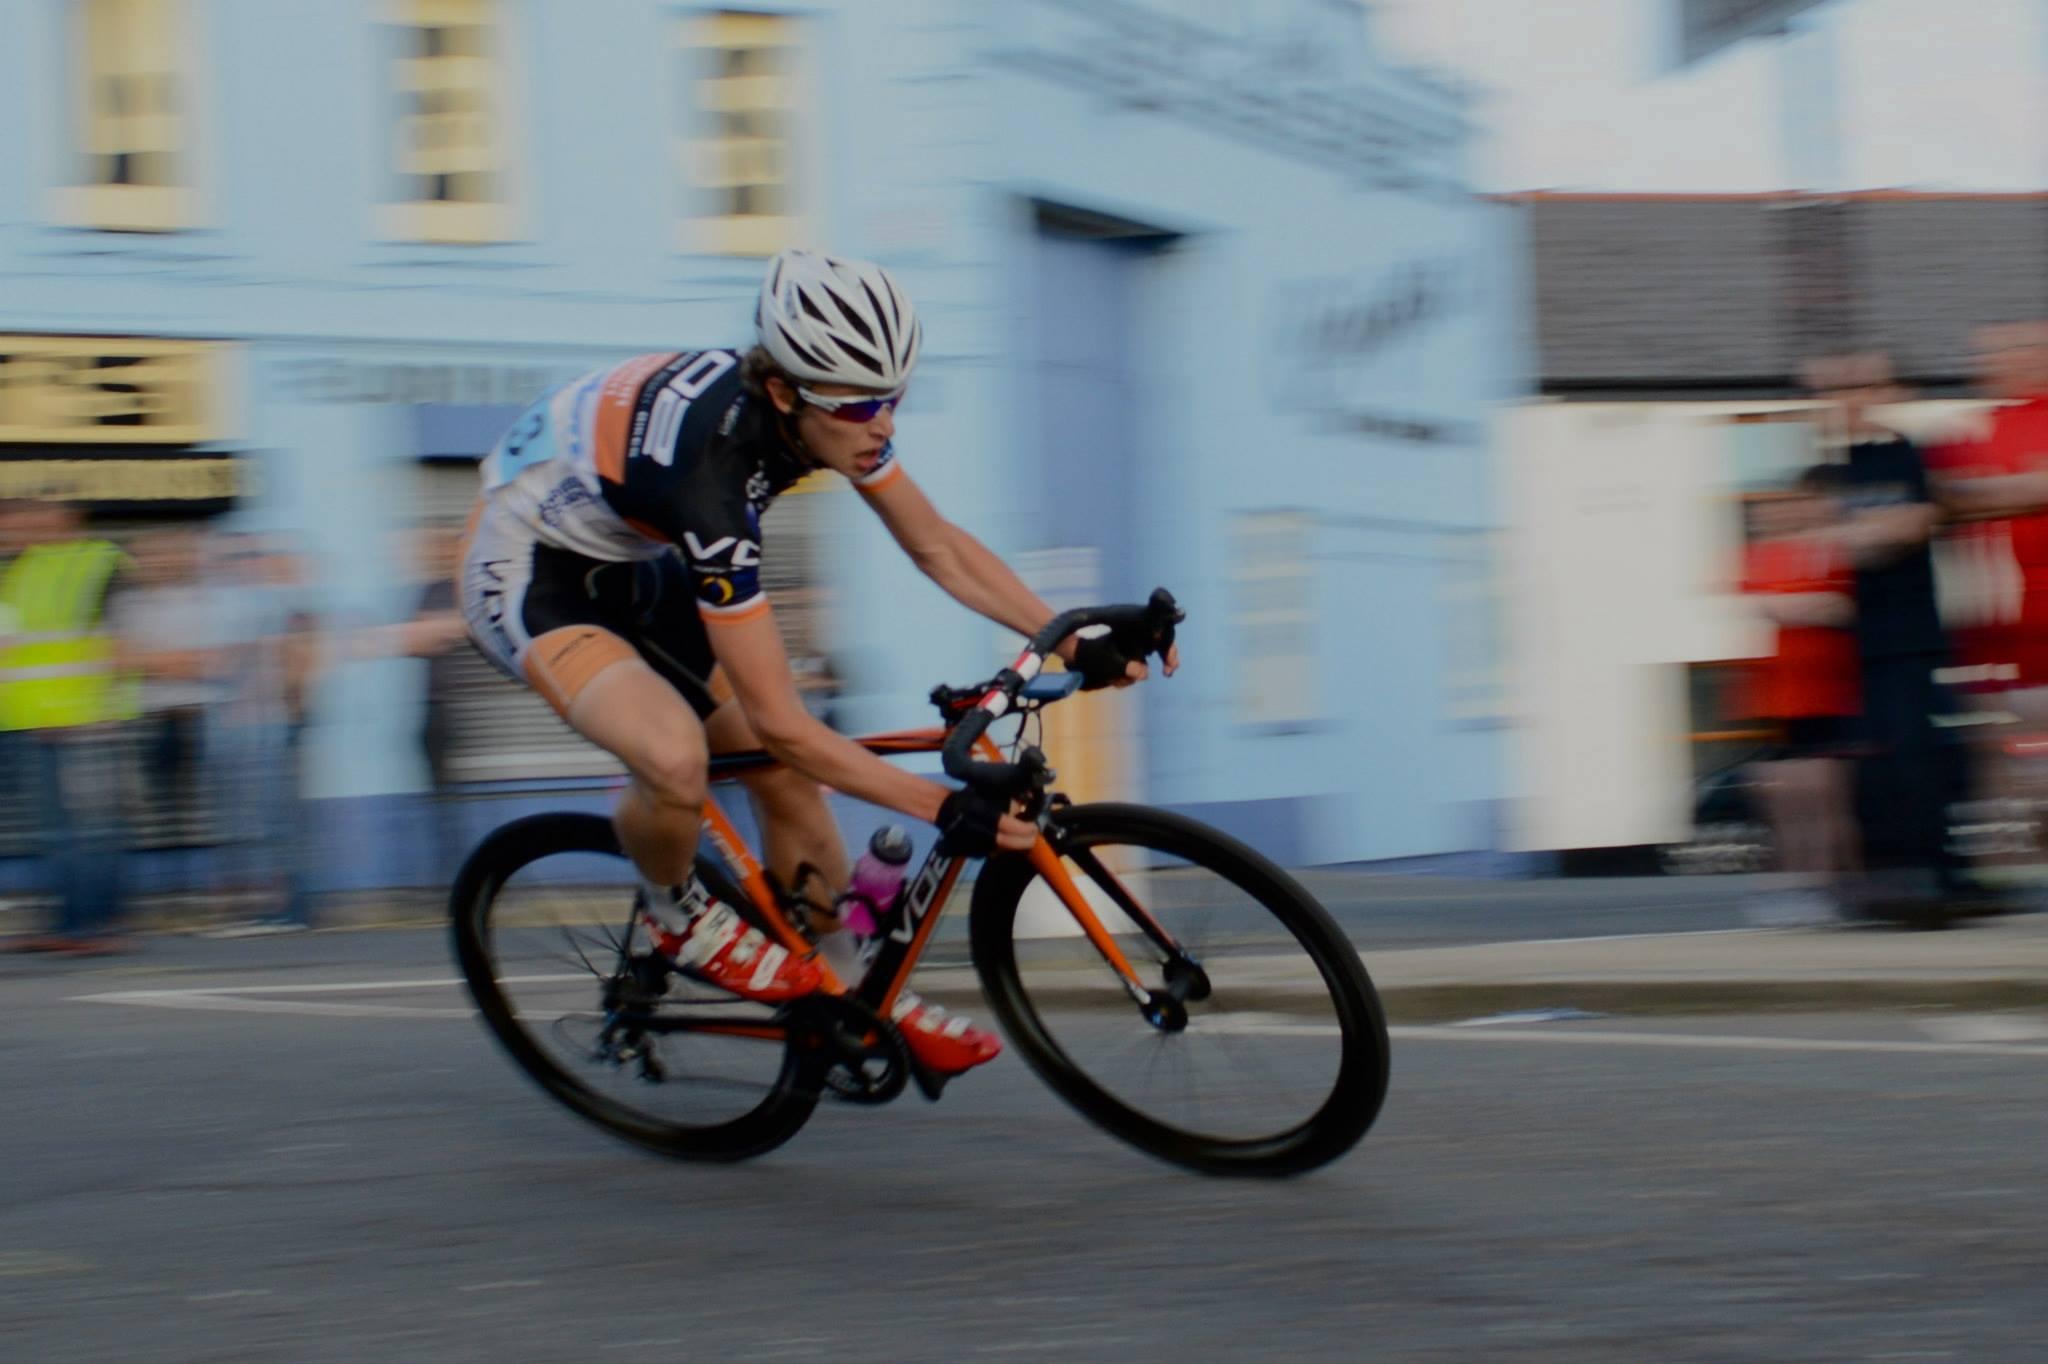 Craig McAuley Road Cycling Training